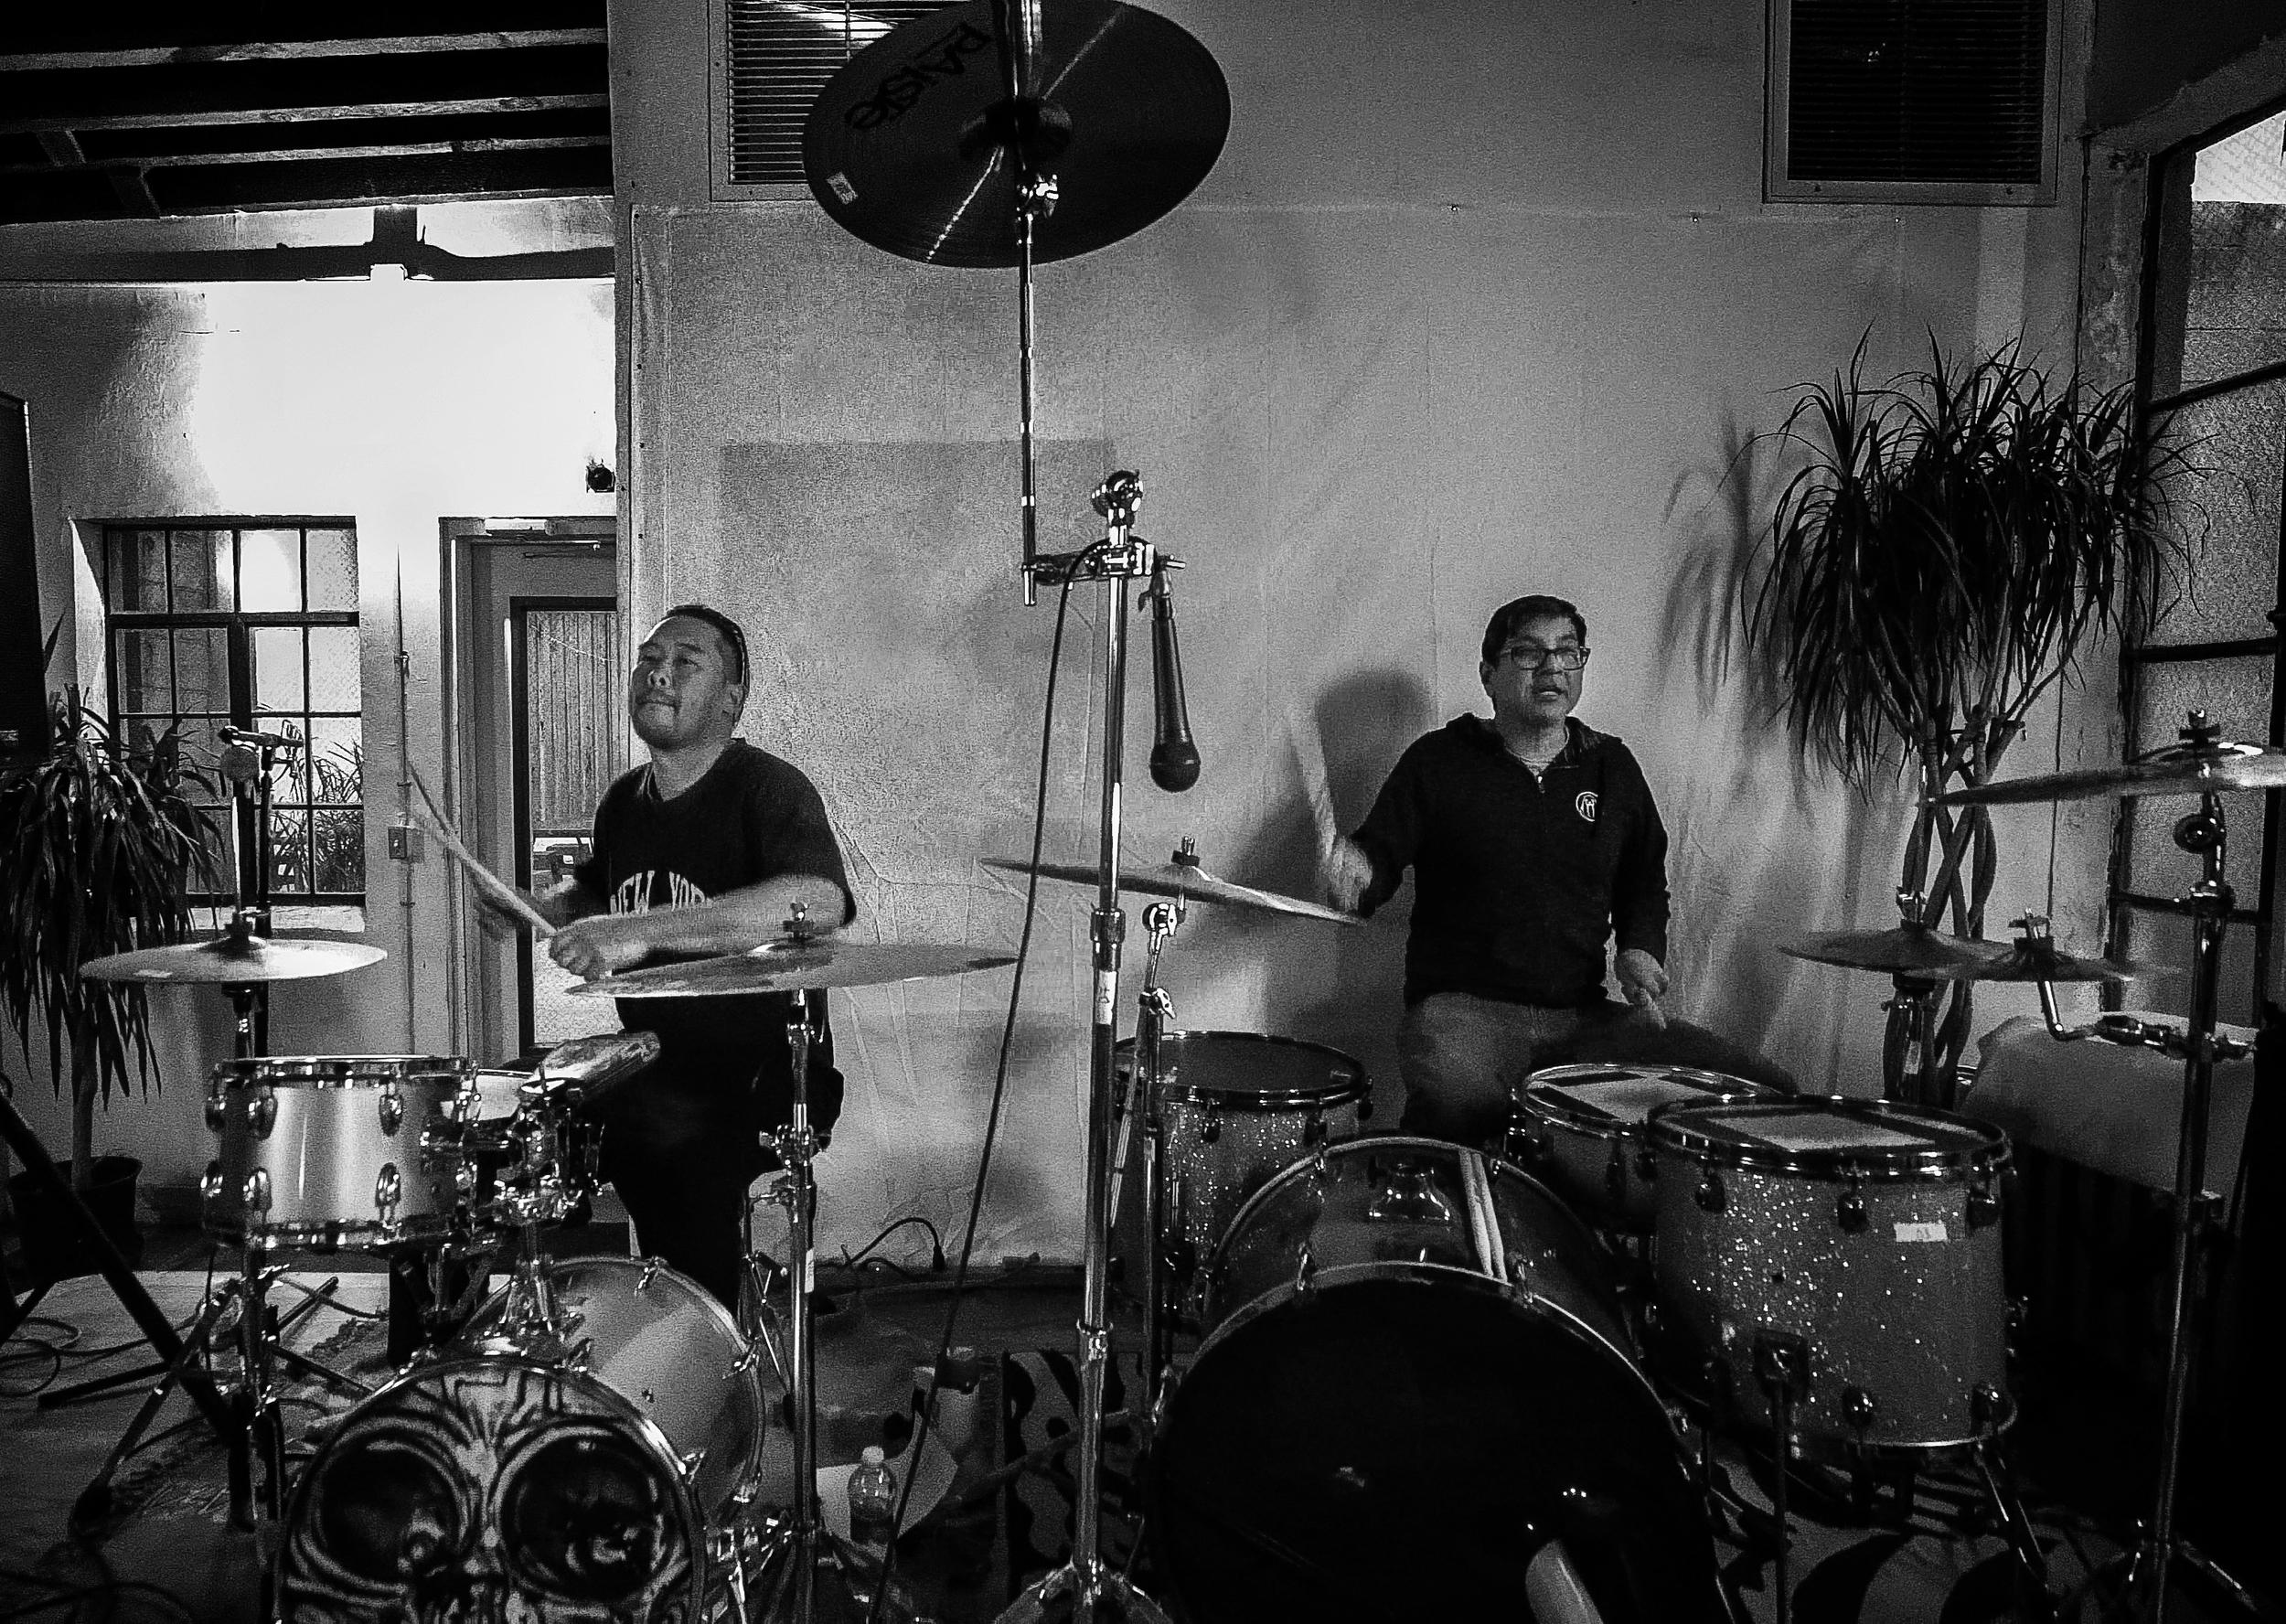 david-choe-mangchi-under-the-cobbletones-lulu-east-coast-tour-2016-tour-live-music-16.jpg